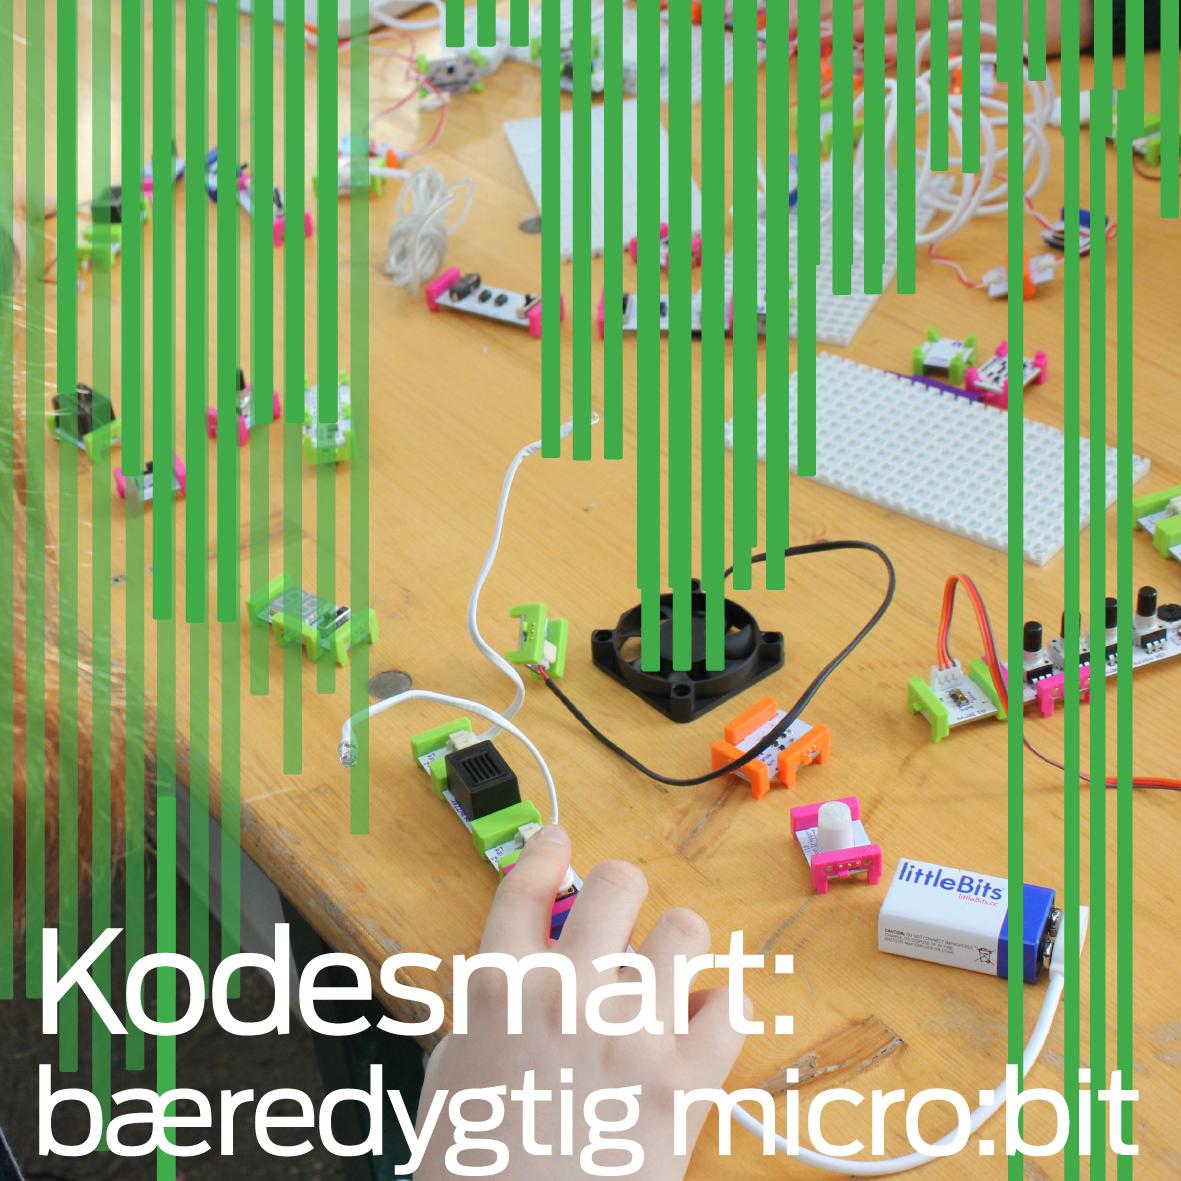 Kodesmart: Bæredygtig micro:bit